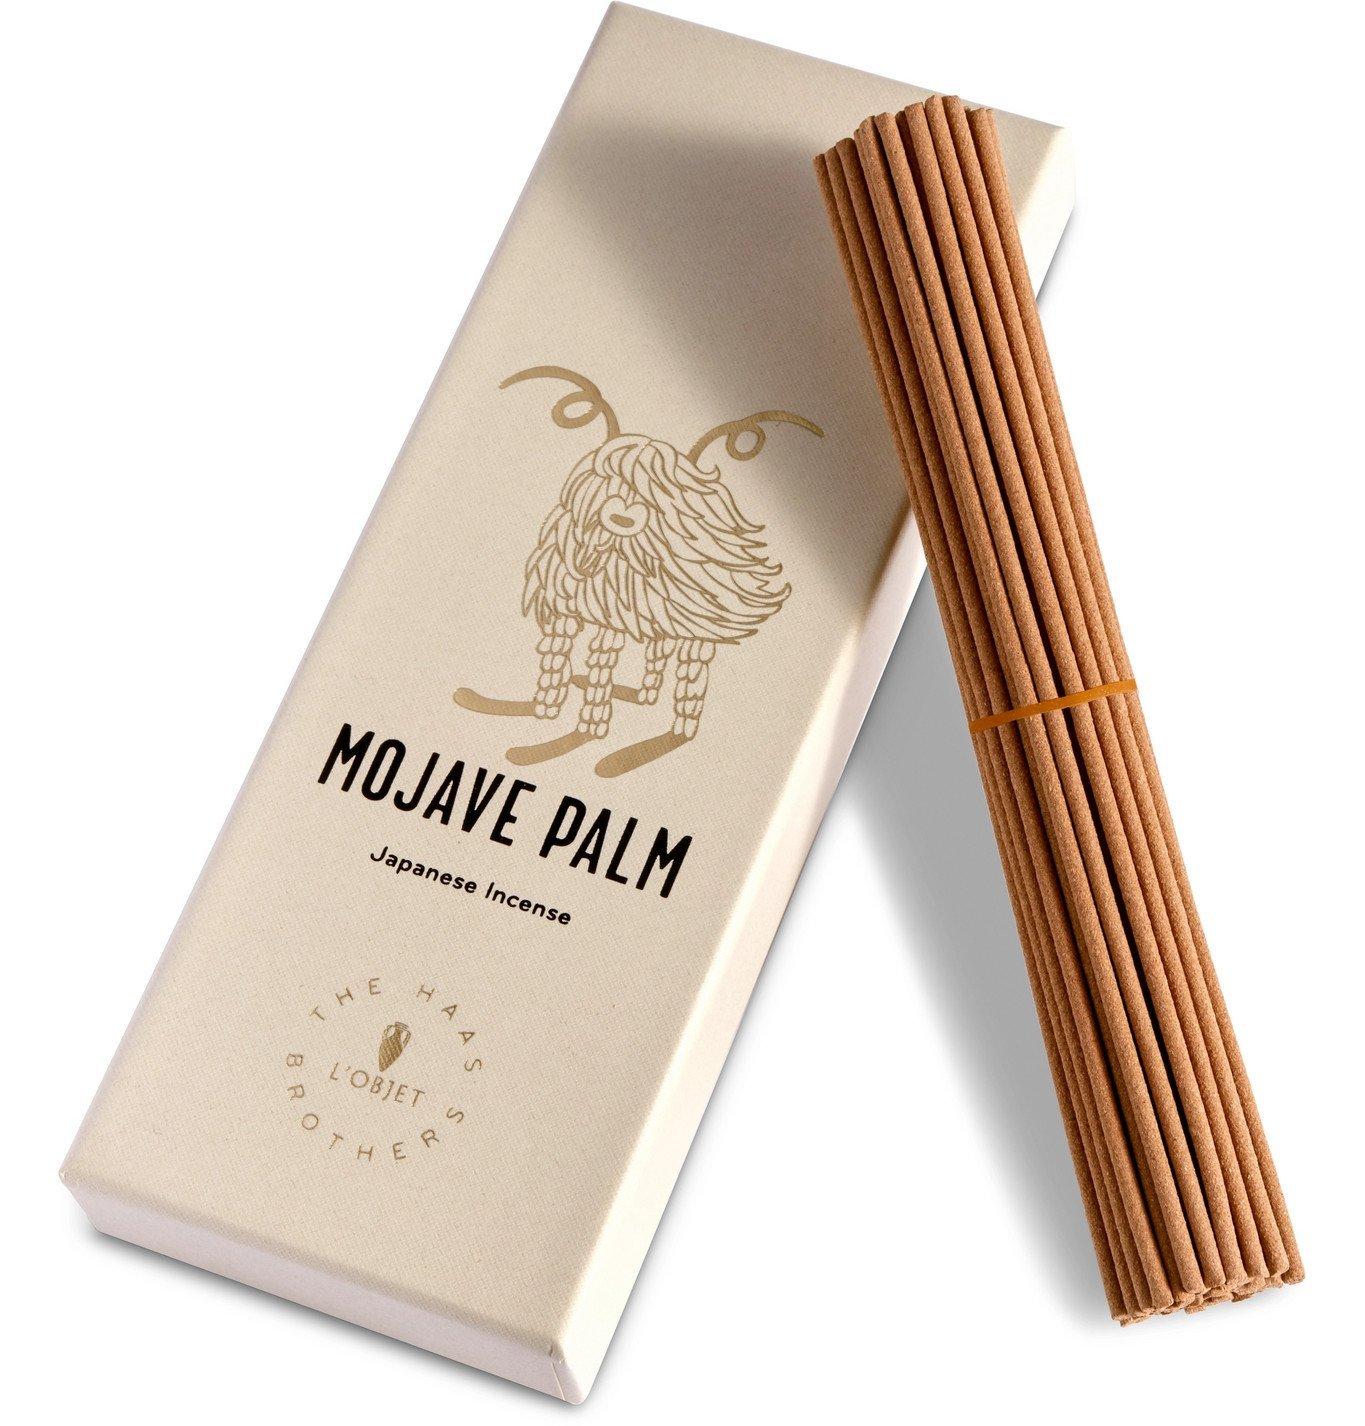 Photo: L'Objet - Haas Mojave Palm Incense Sticks - Colorless